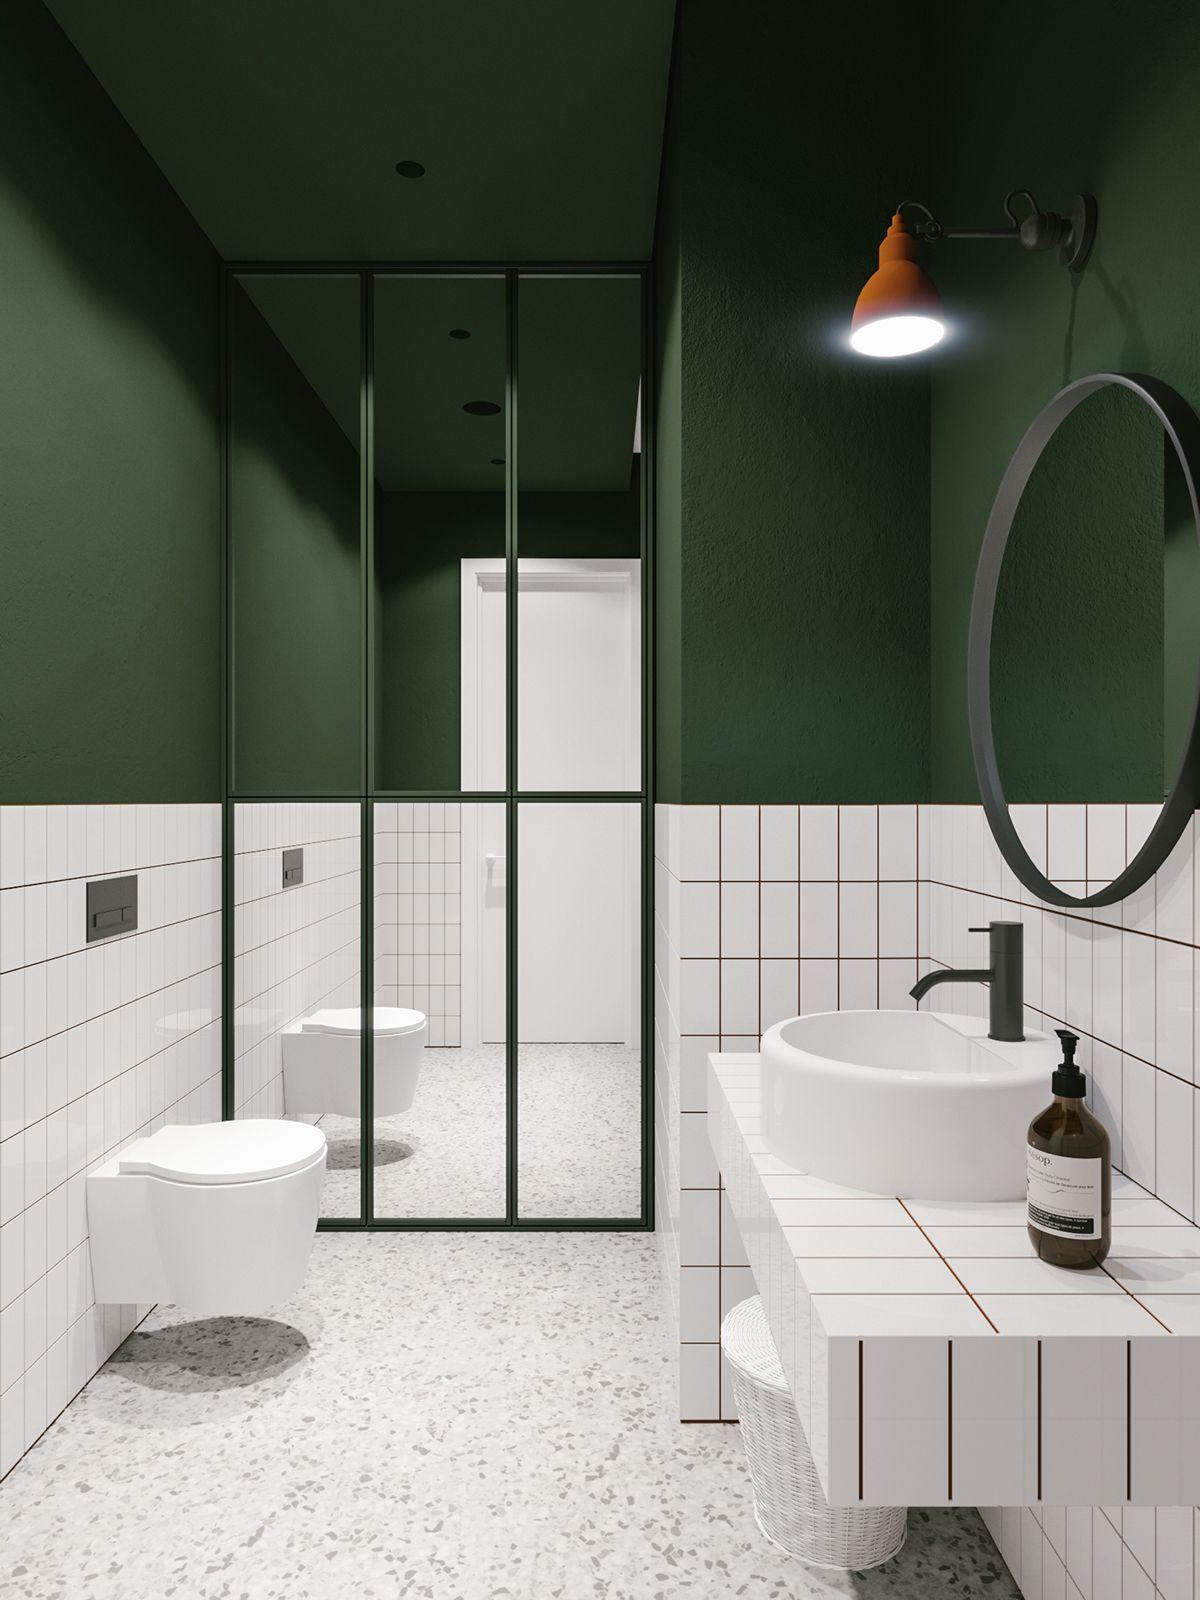 bb8a8f57030203.59c58a1a0e829.jpg 1 200×1 600 пикс | Bathroom ...